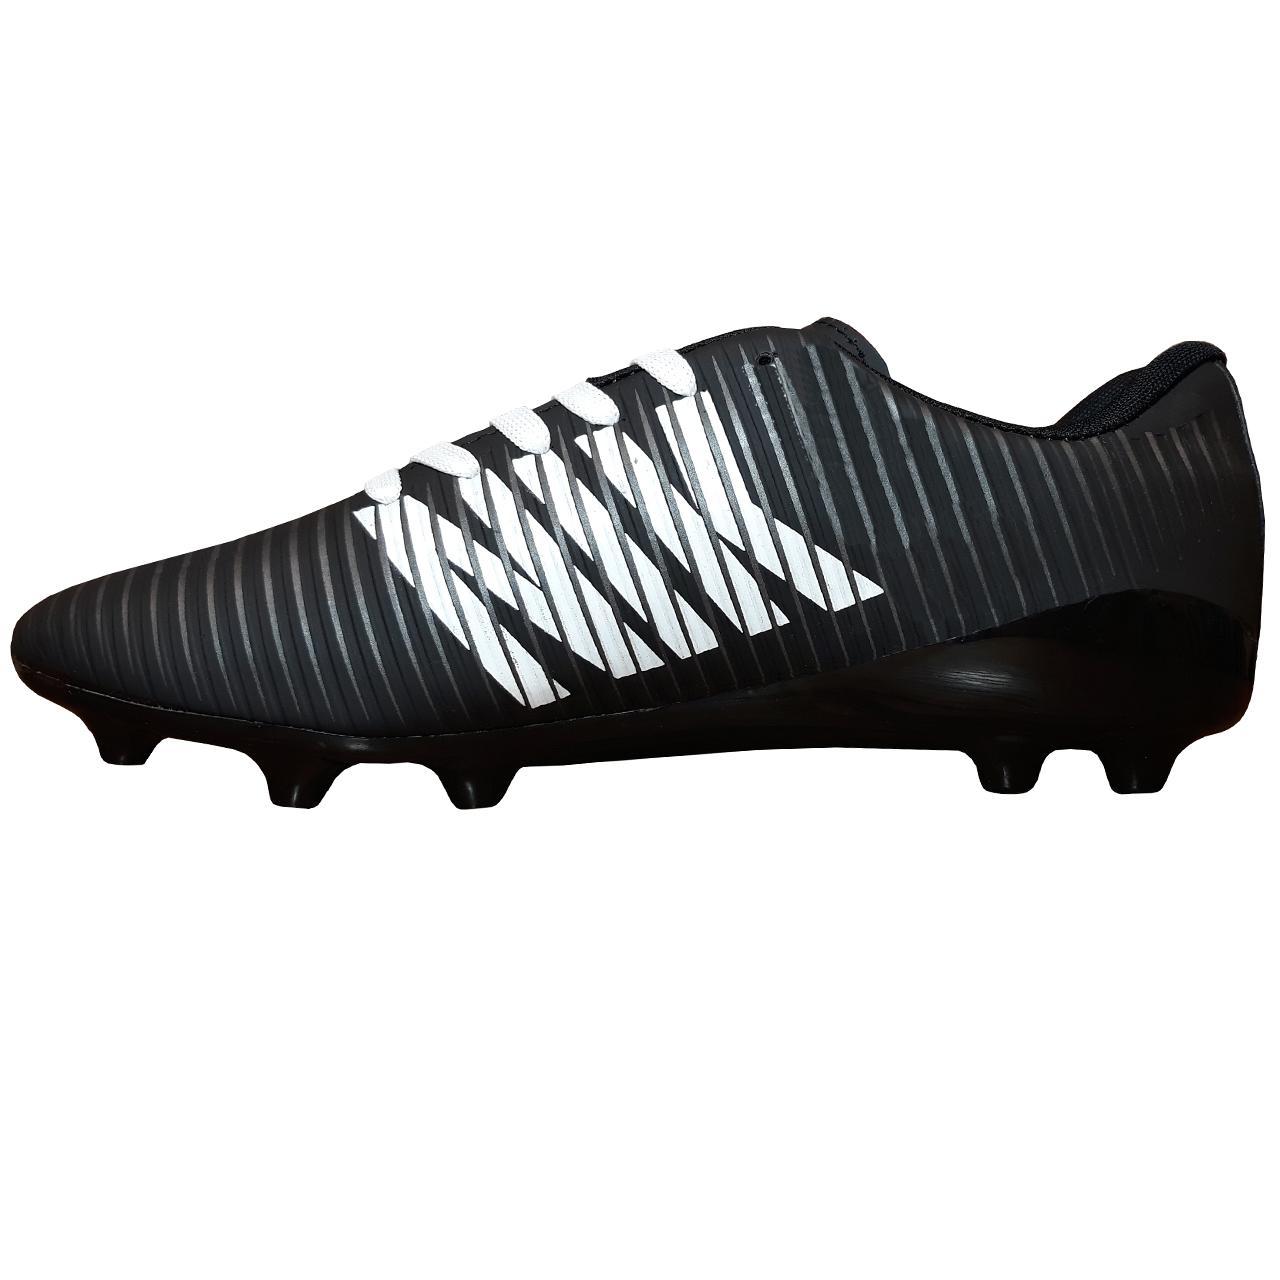 کفش فوتبال مردانه مدل sp87